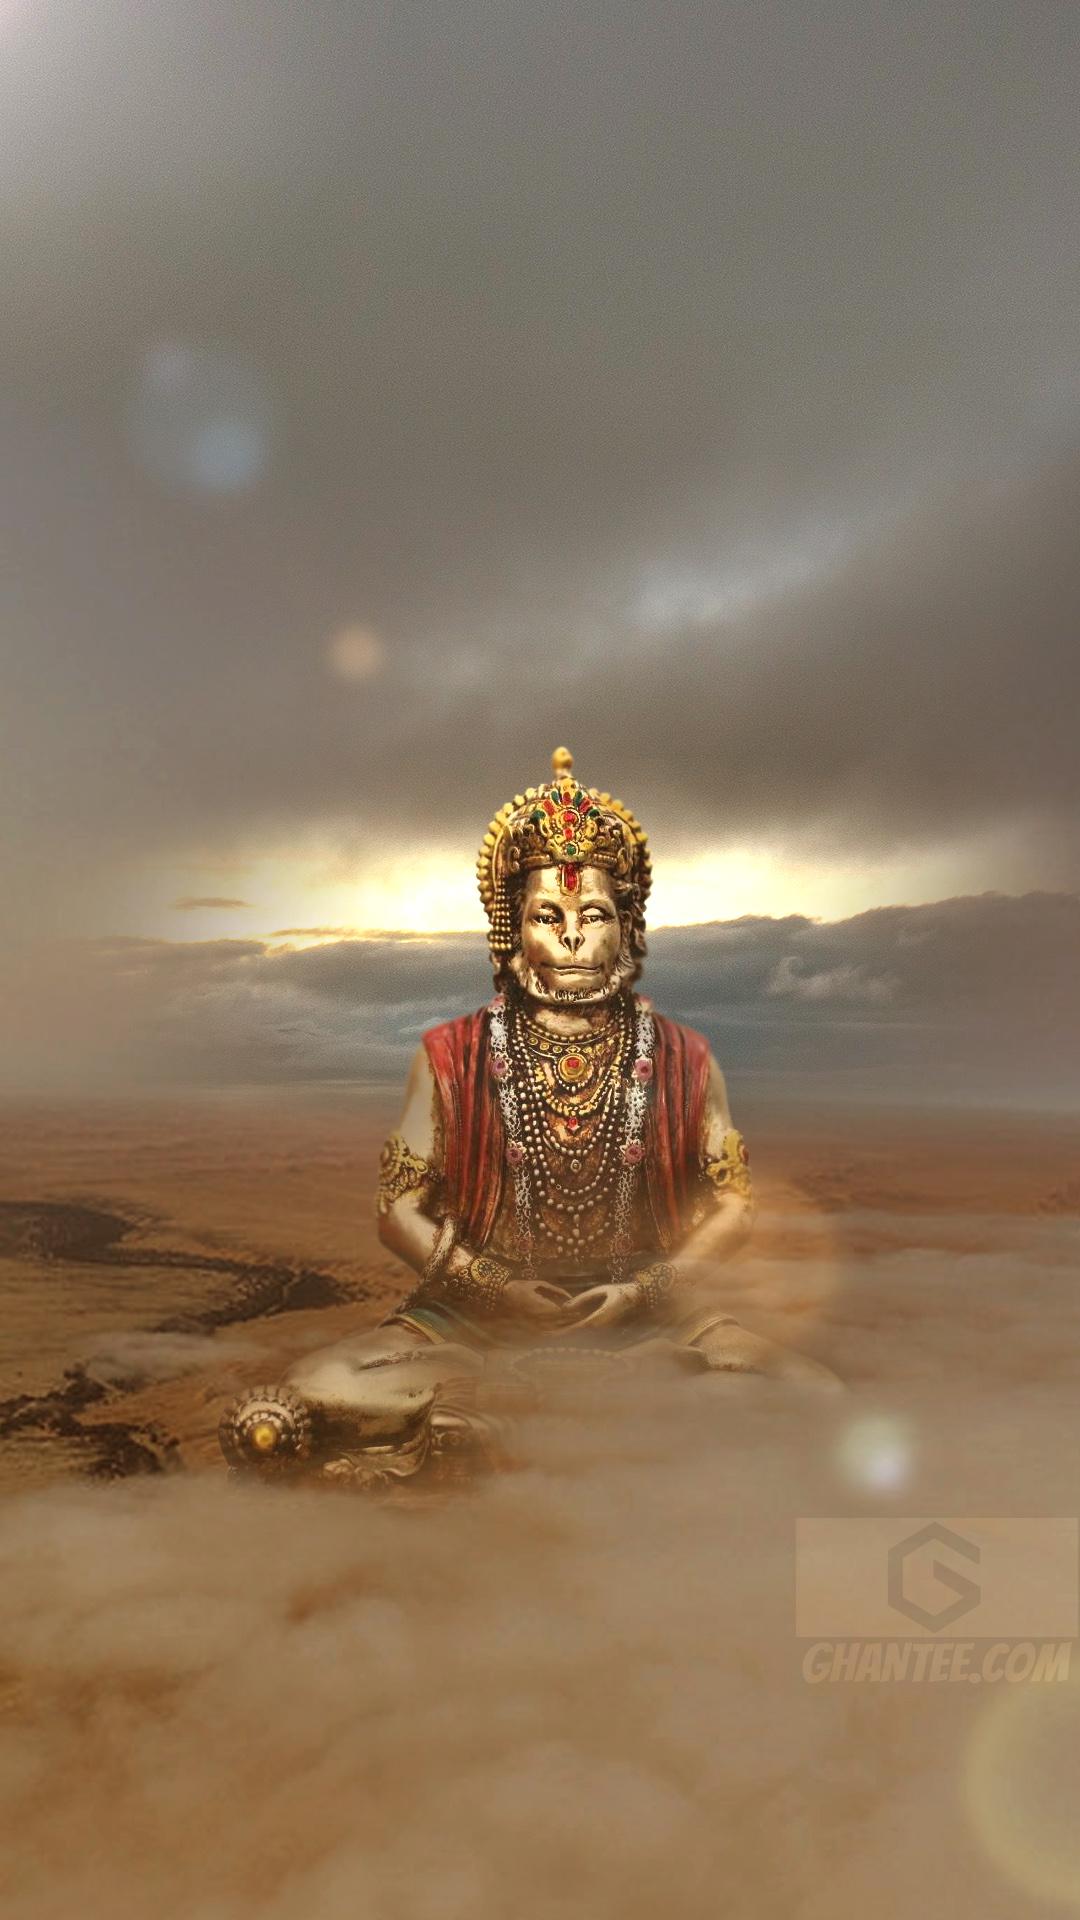 pavanputra hanuman hd phone wallpaper